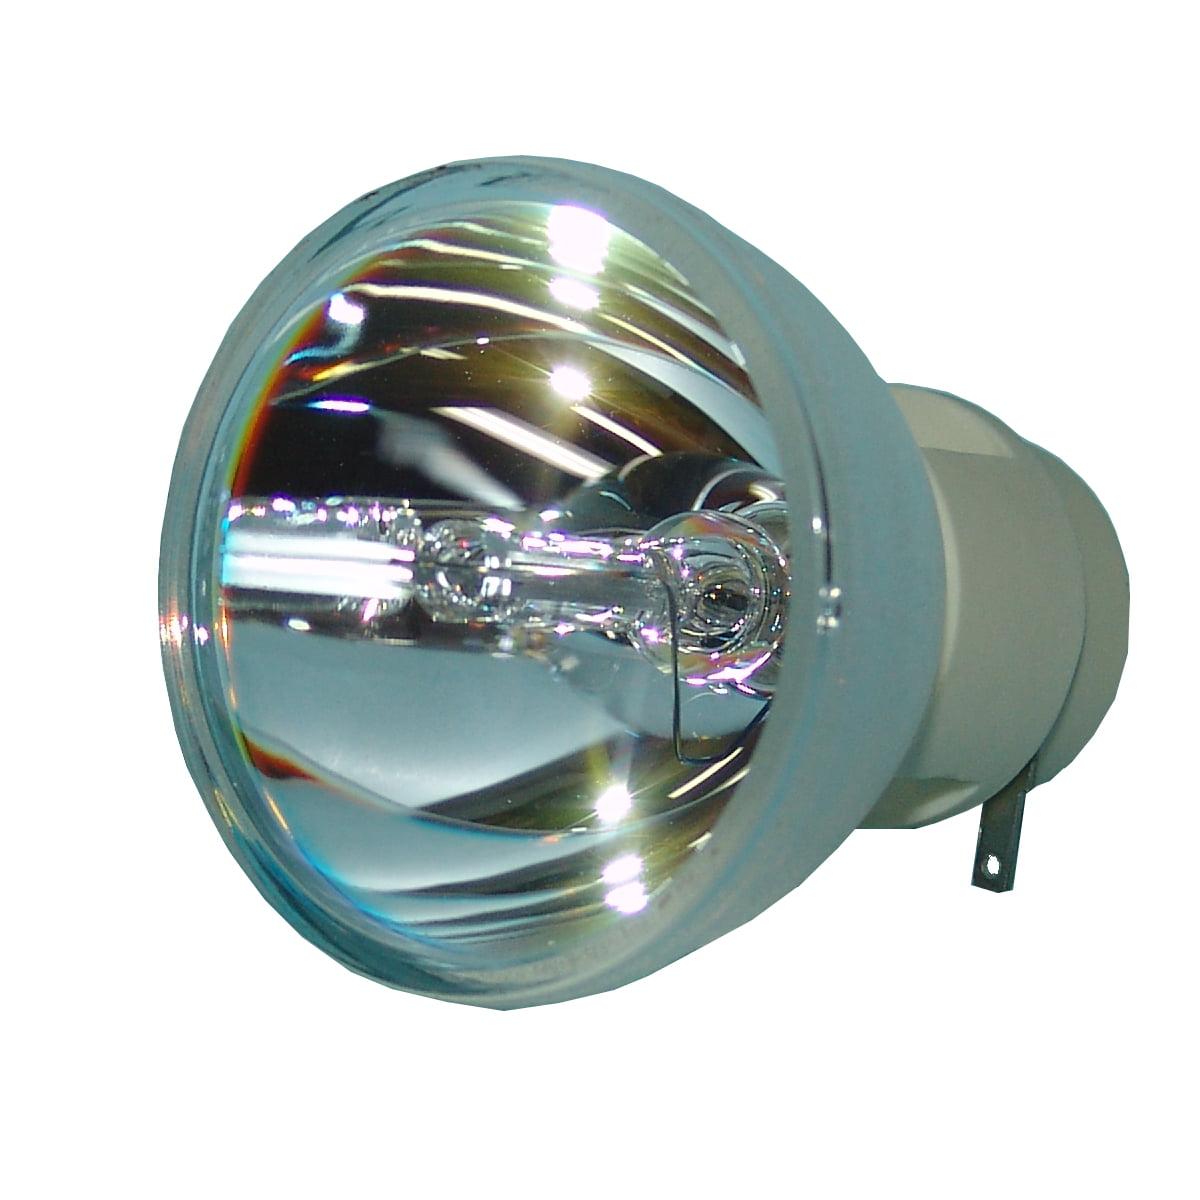 Osram Bare Lamp For Osram 69080-1 / 690801 Projector DLP LCD Bulb